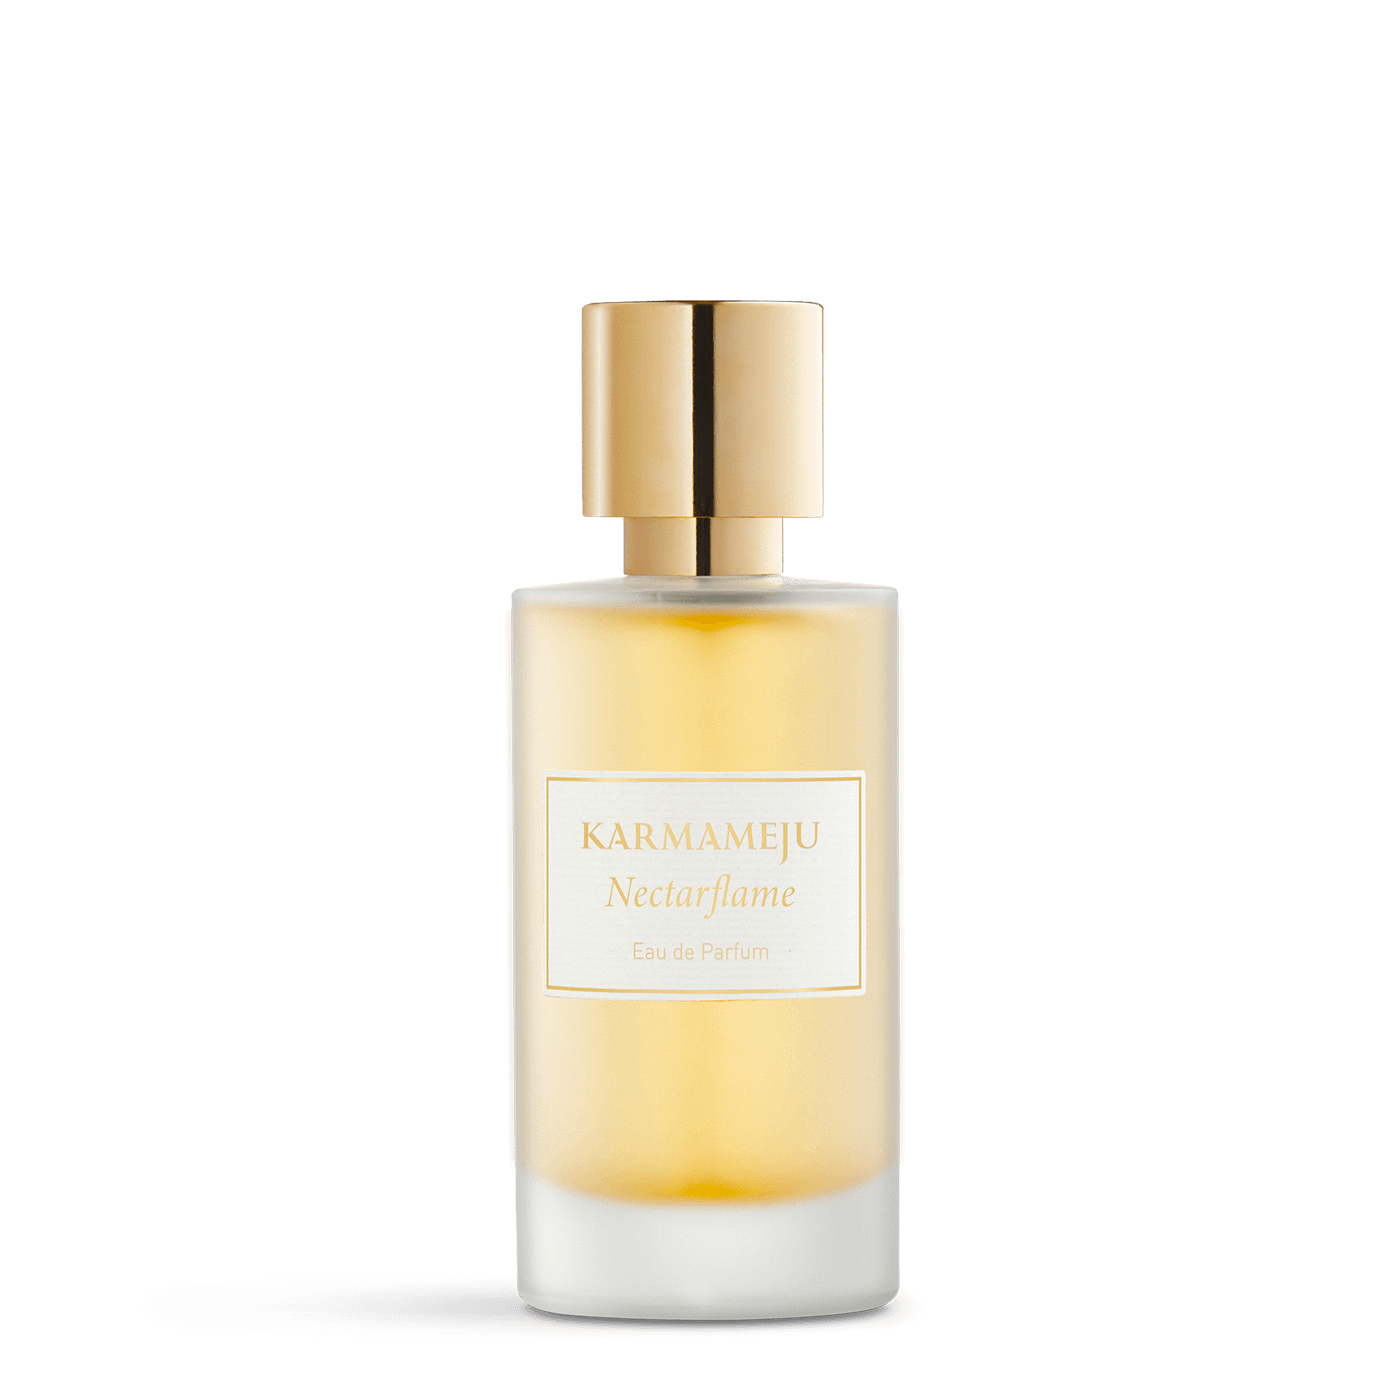 Karmameju NECTARFLAME / Eau de Parfum